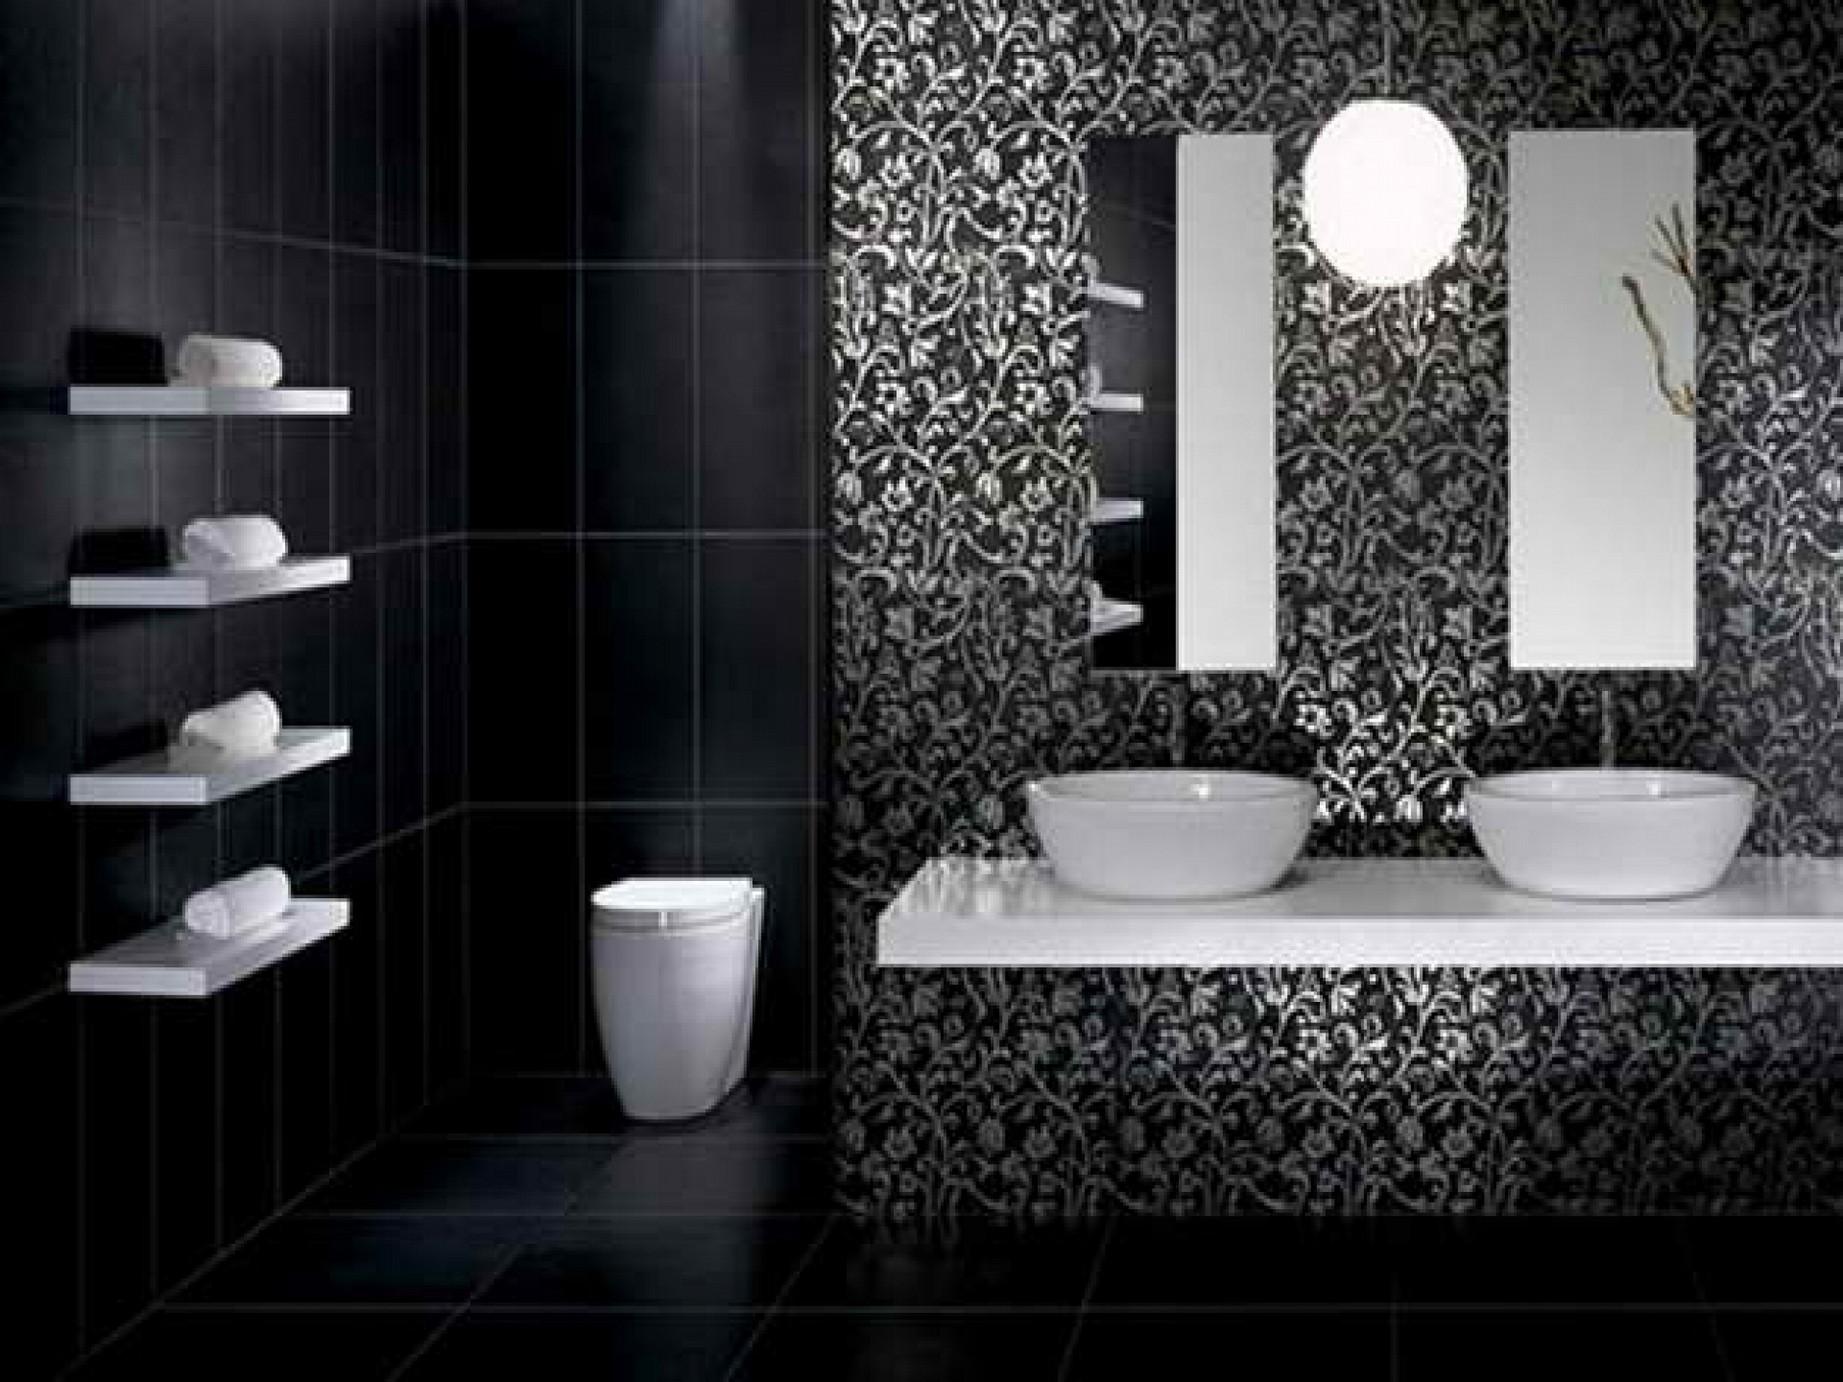 Black And White Wallpaper For Bathrooms Photo Modern Black Bathroom Designs 1843x1382 Download Hd Wallpaper Wallpapertip